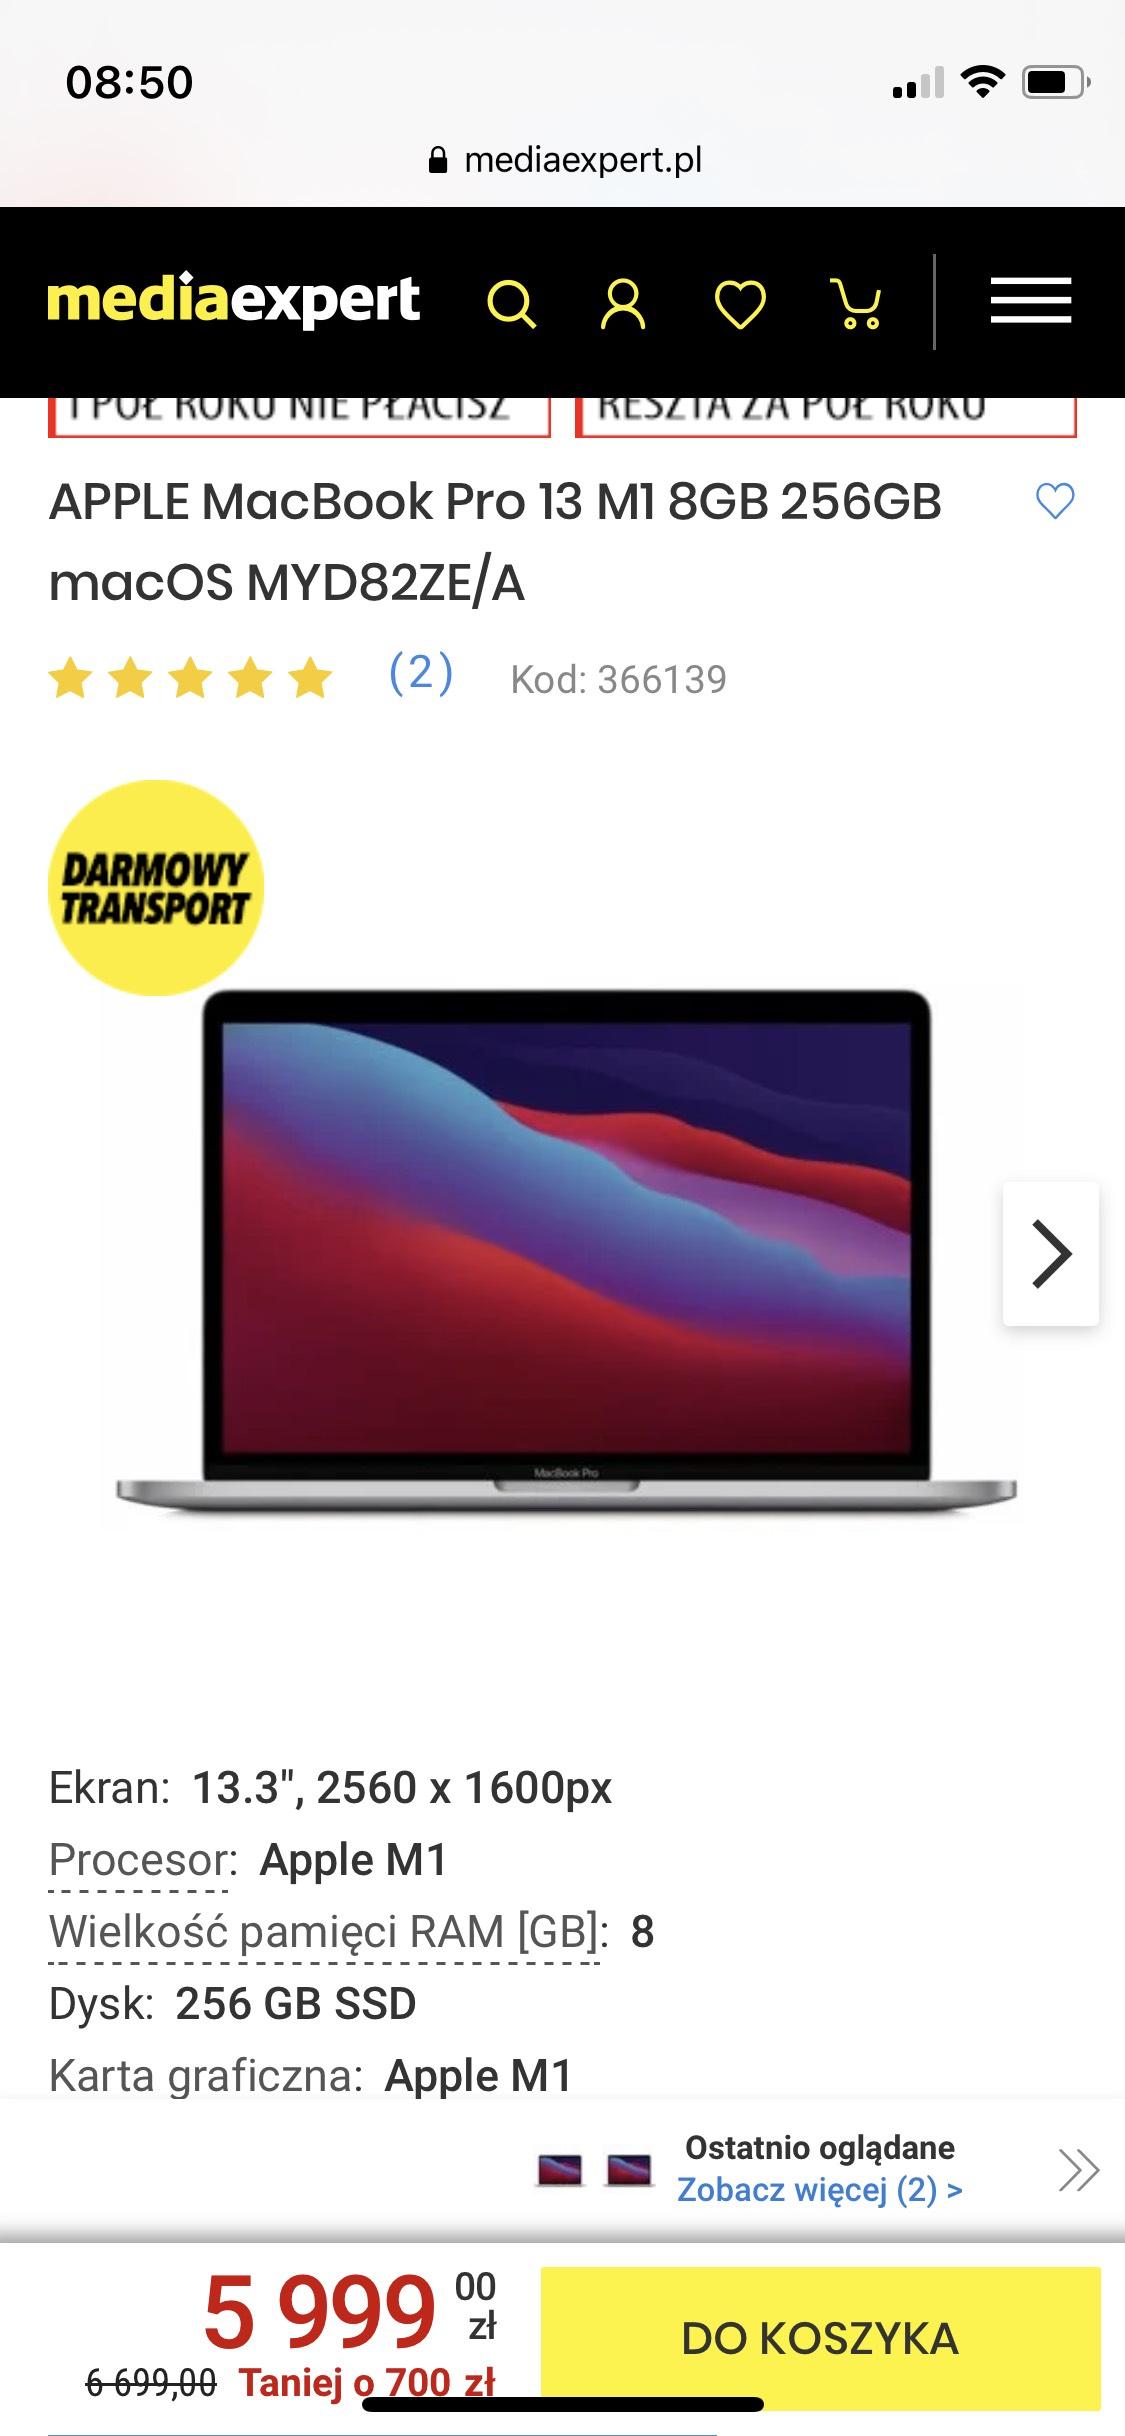 APPLE MacBook Pro 13 M1 8GB 256GB macOS MYD82ZE/A